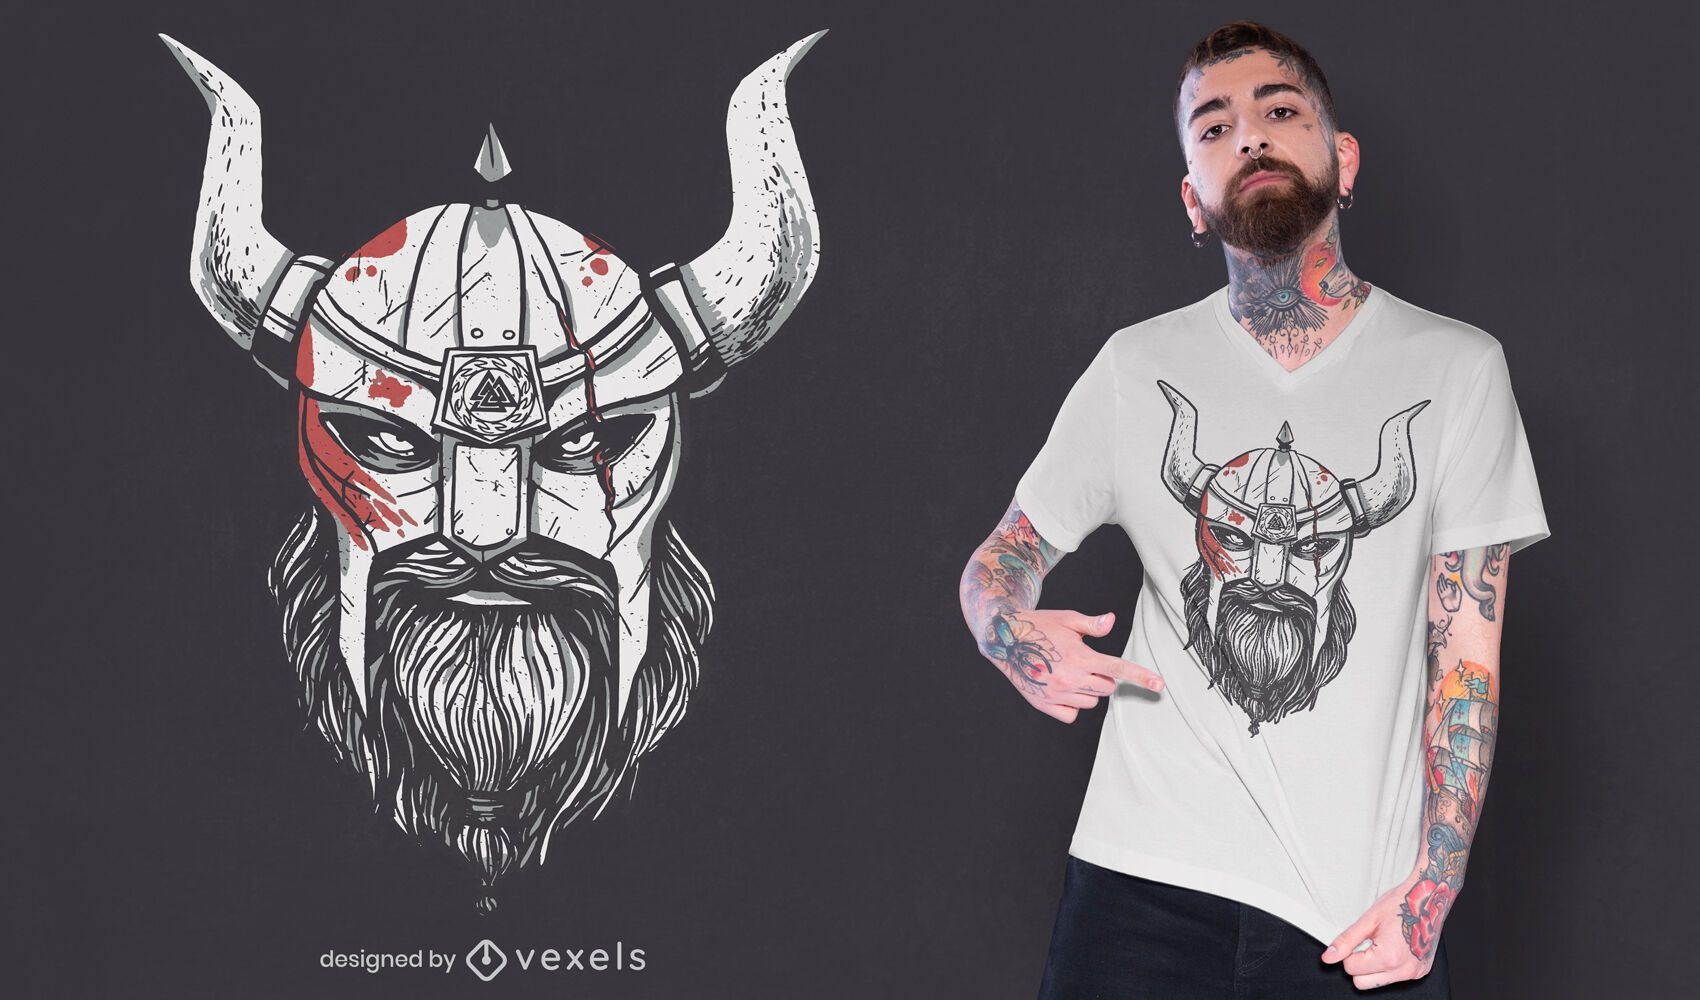 Viking head bloody helmet t-shirt design